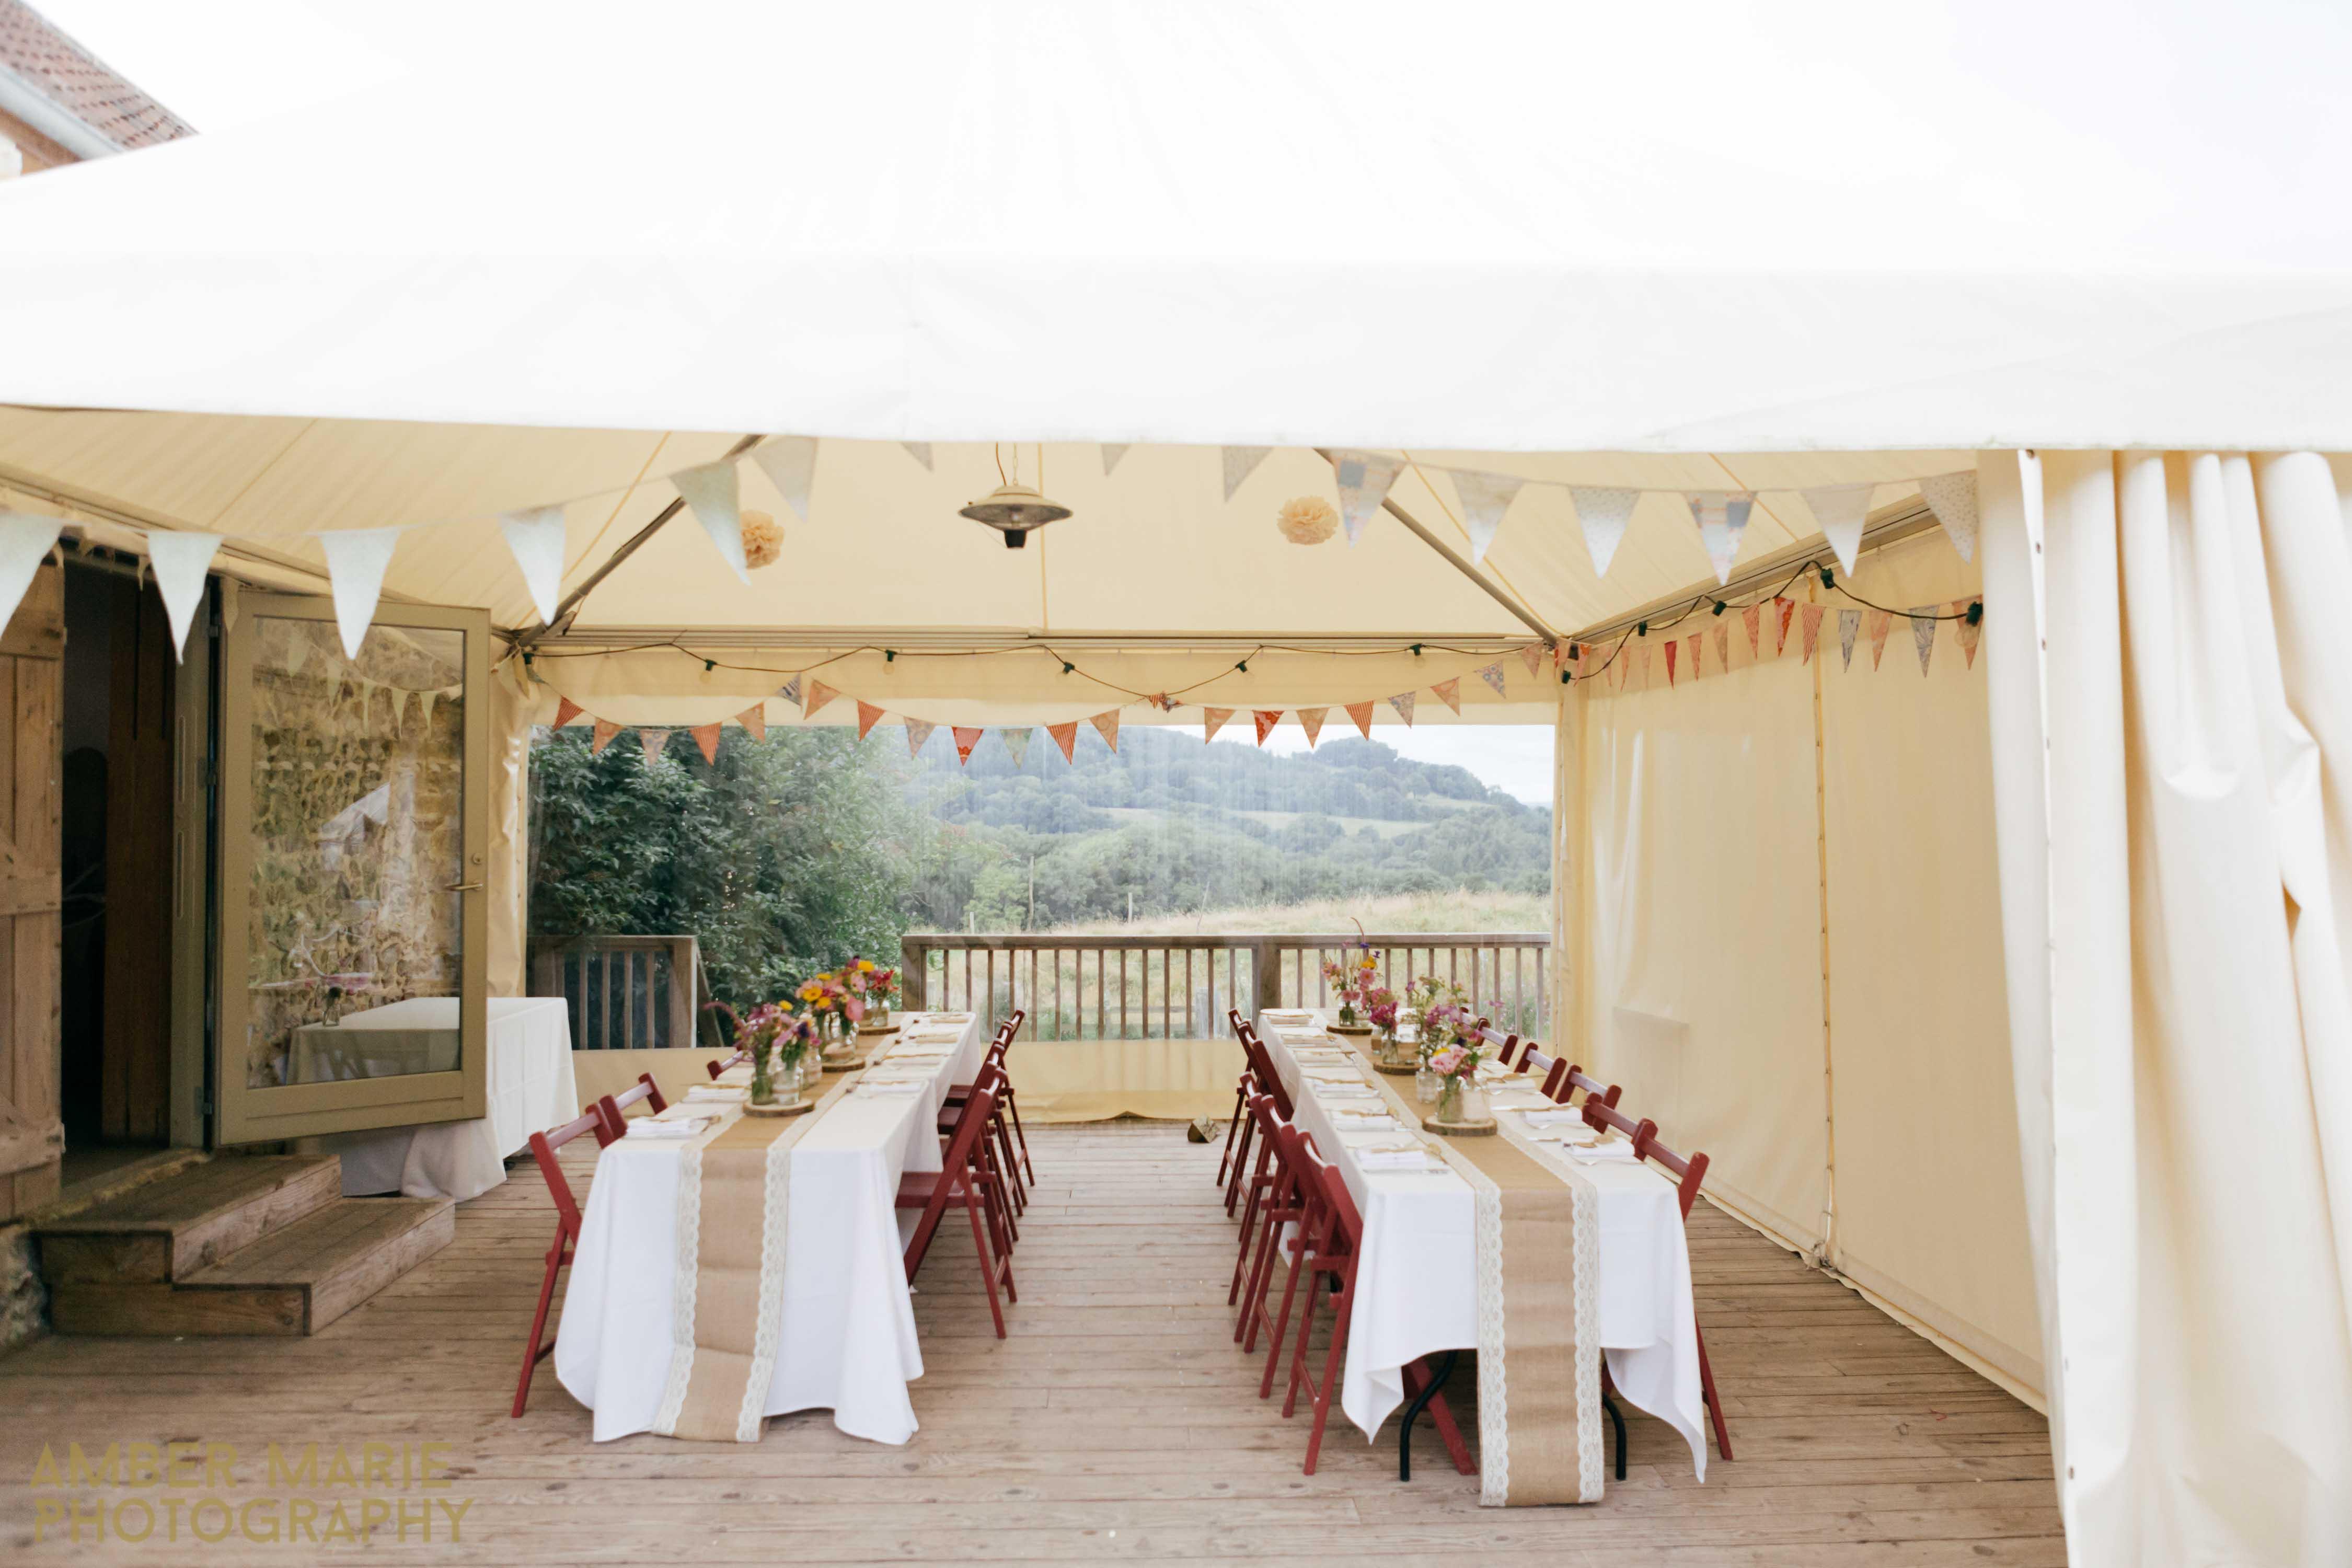 CRiver cottage wedding photography creative wedding photographers leeds yorkshire